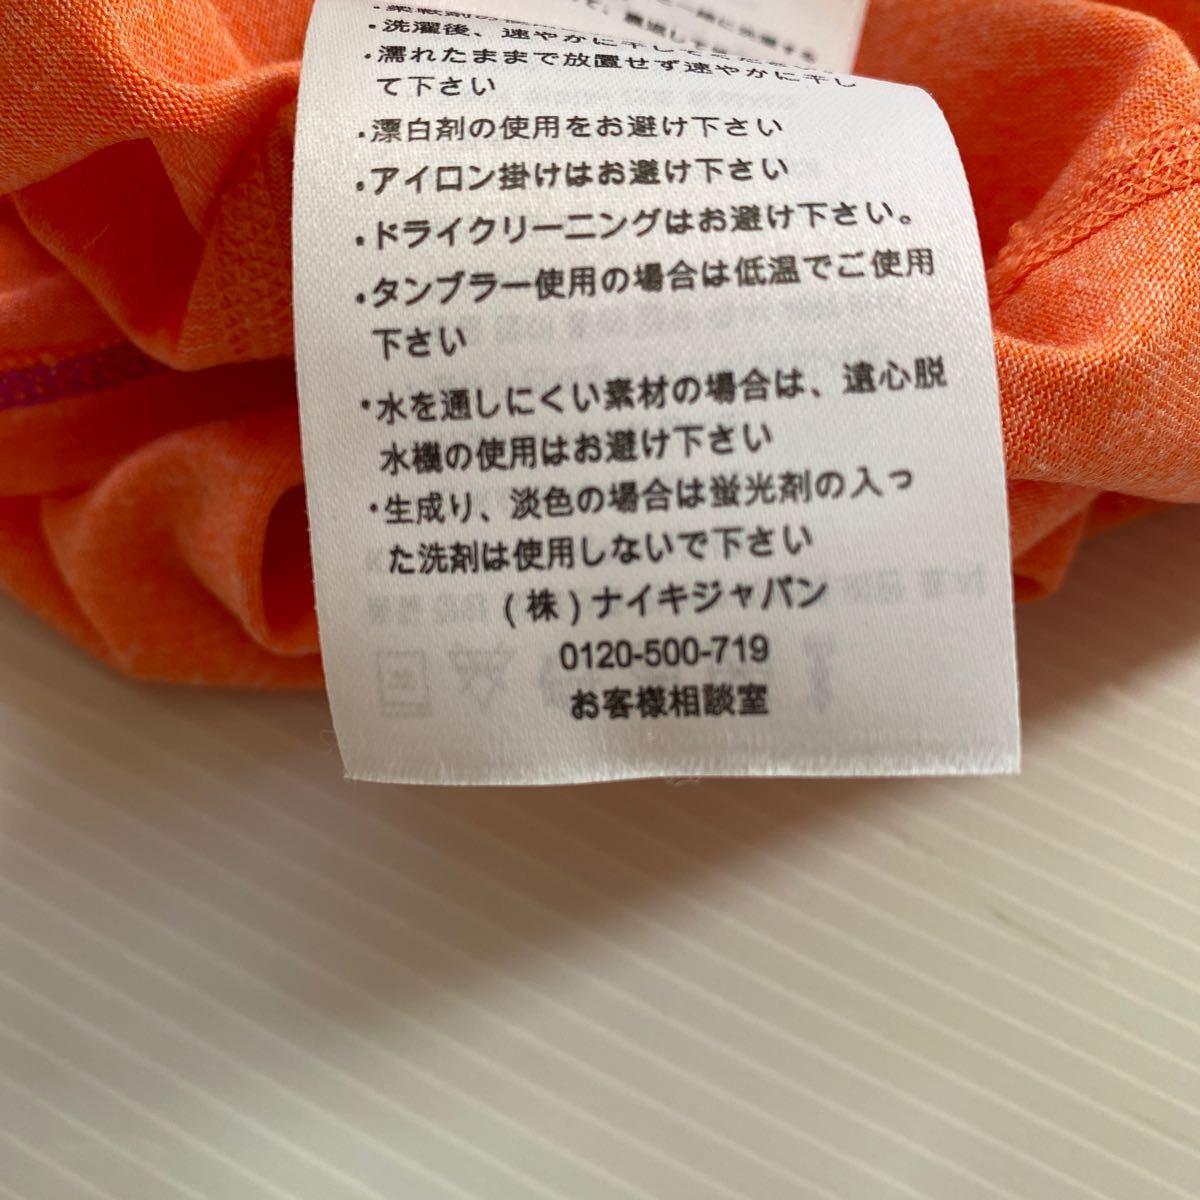 NIKE ナイキ タンクトップ M中古 ドライフィット 速乾仕様 シャーベットオレンジ×ピンク 反射 リフレクト ミニポケット ラン ヨガ エクサ